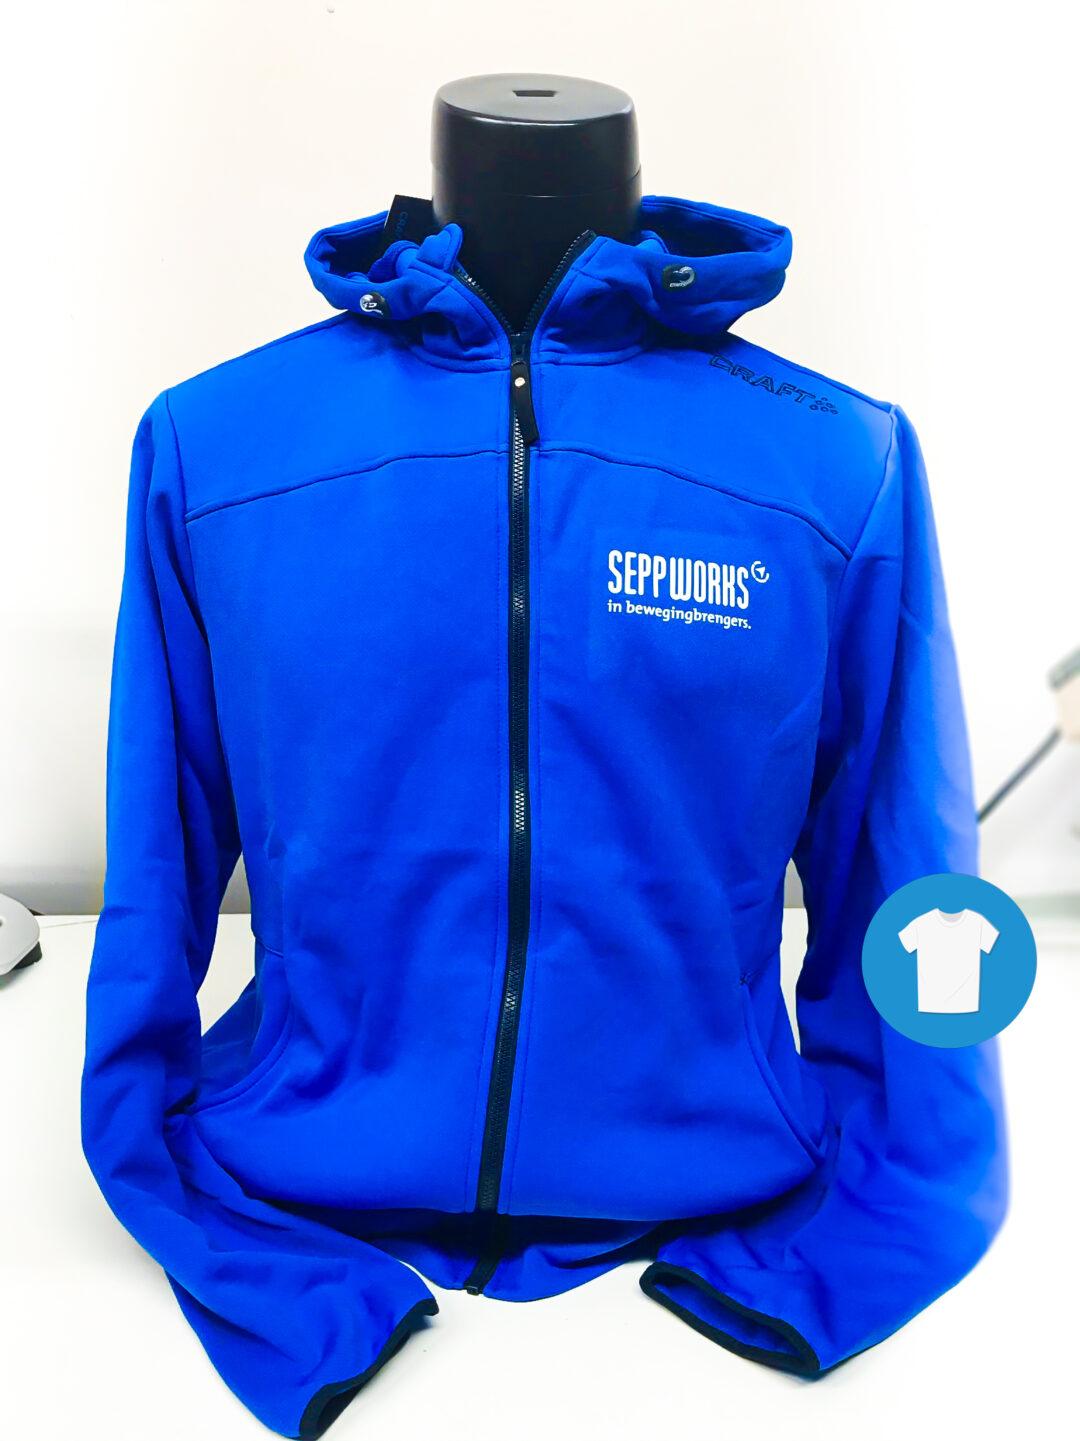 Signaal Bedrijfskleding // Seppworks // Bedrukken van sportkleding, softshell jassen en rugzakken